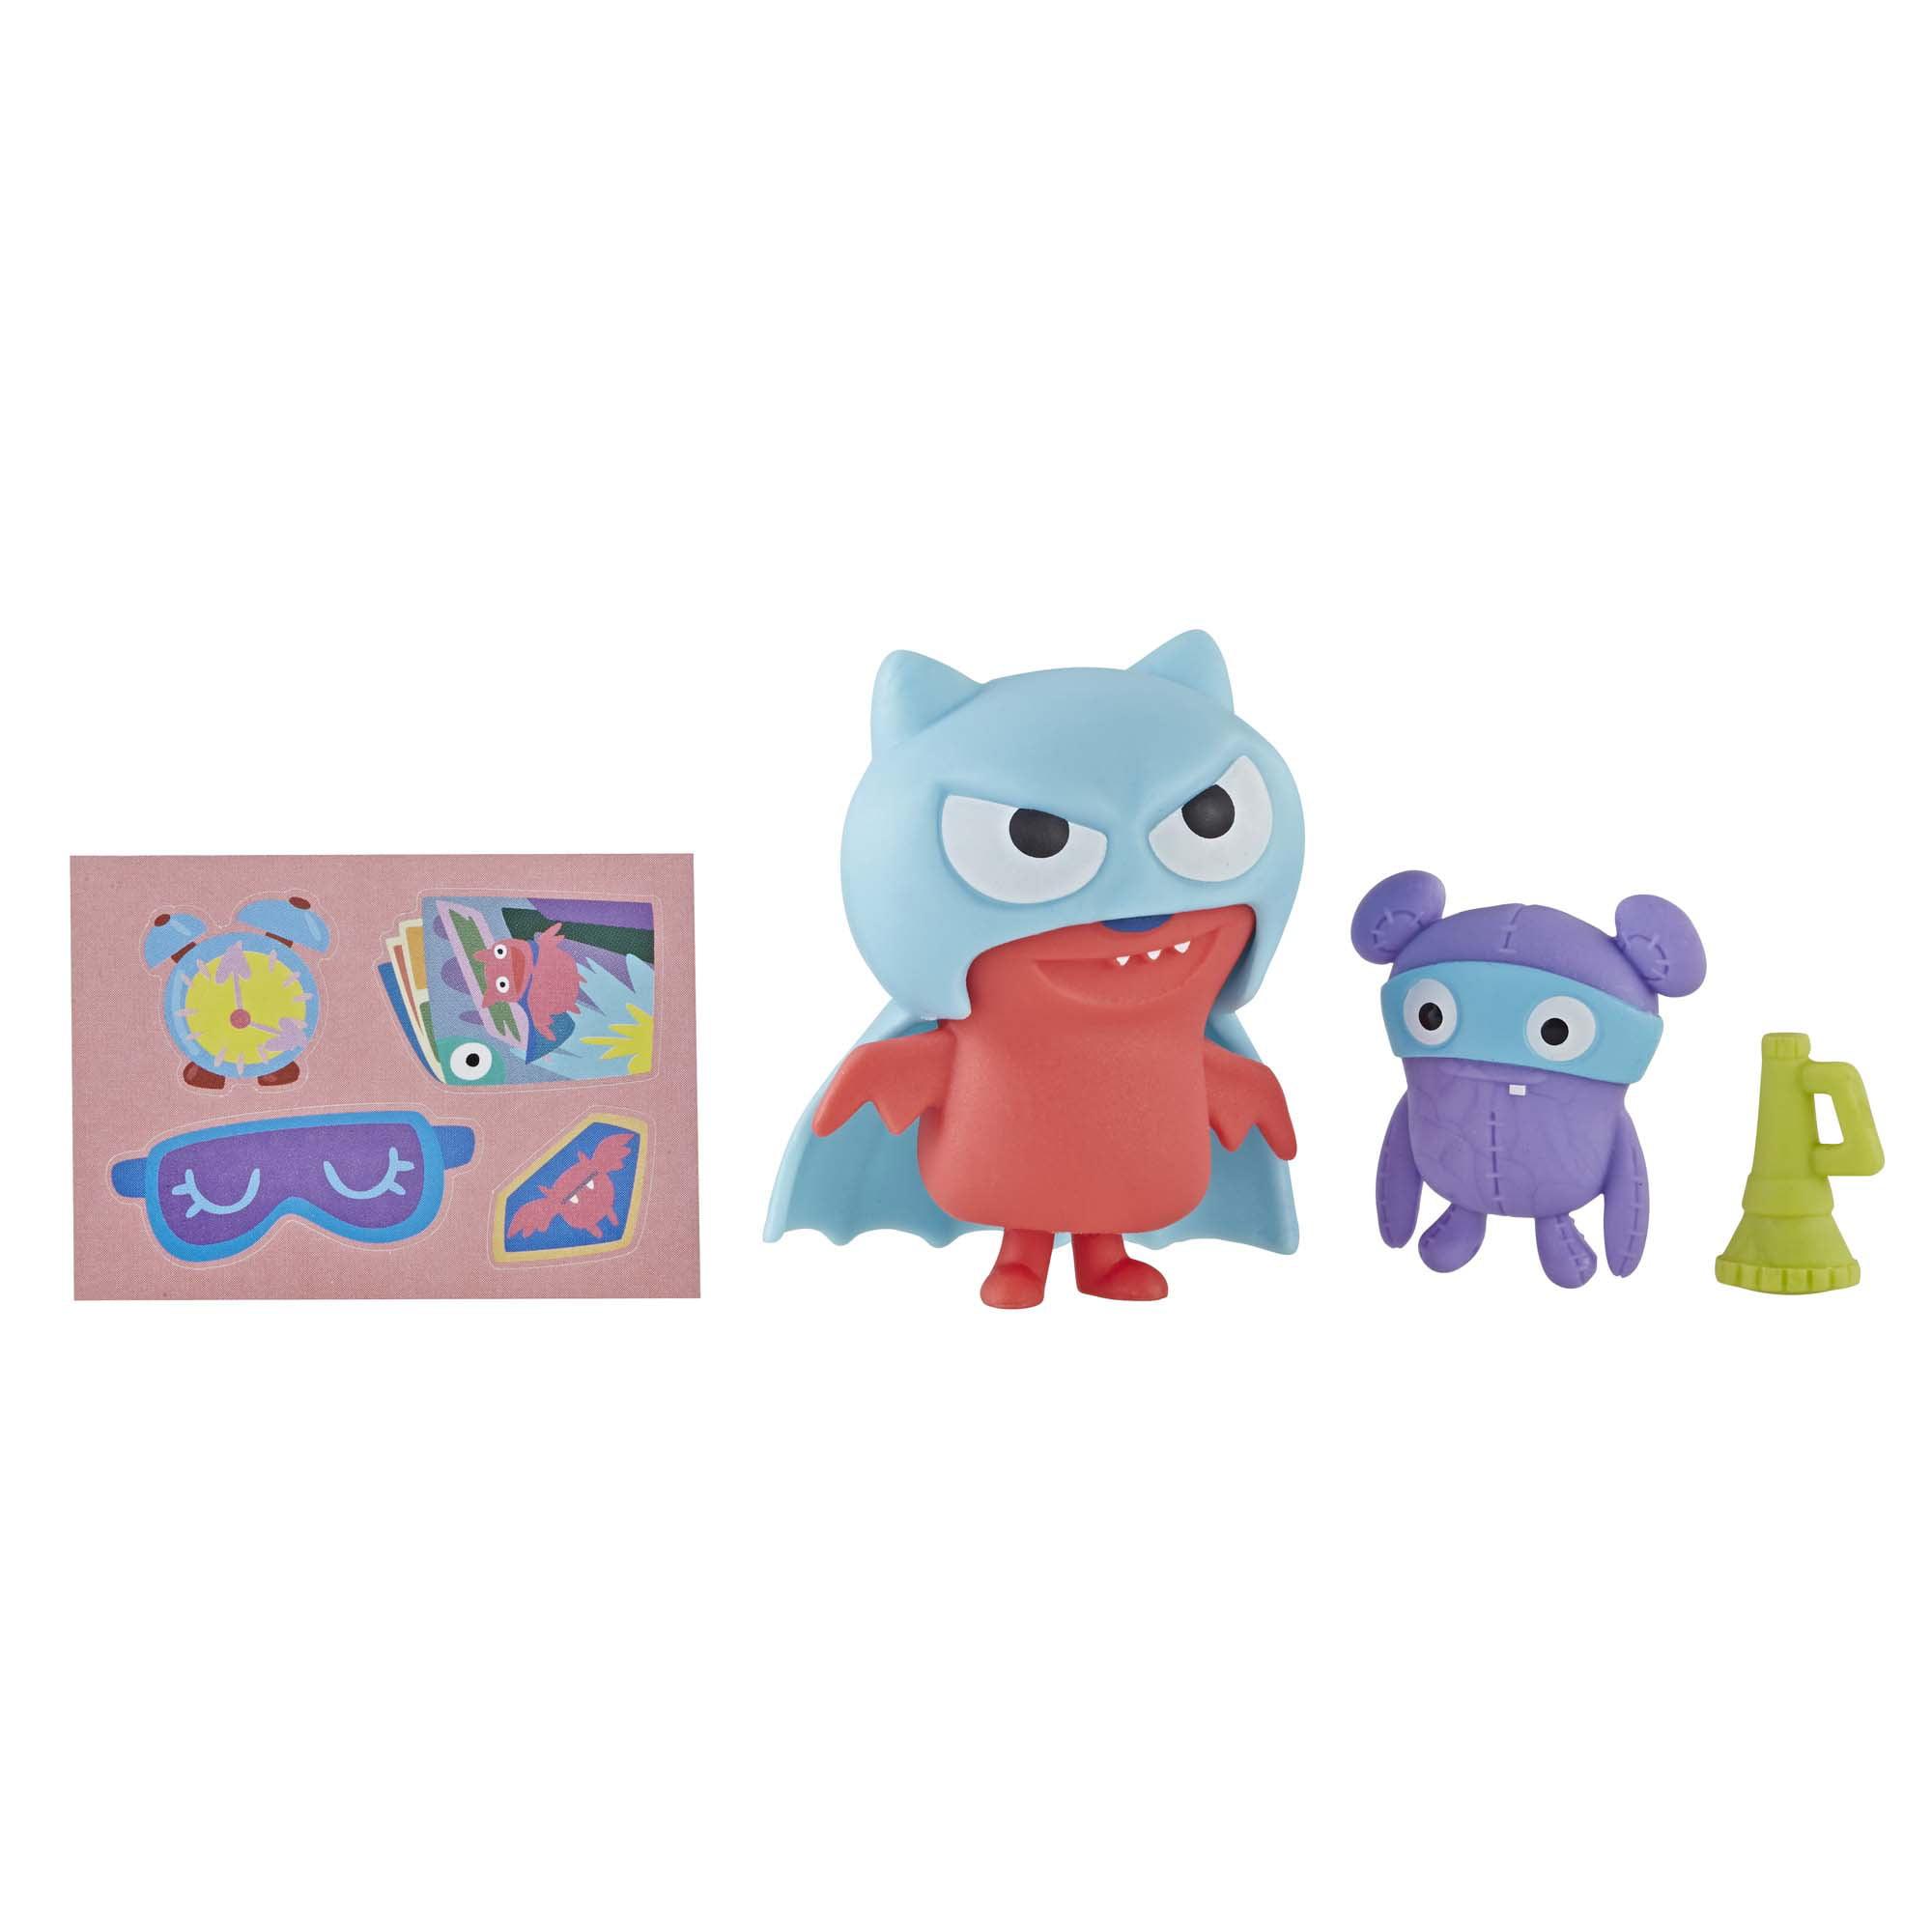 UglyDolls Surprise Disguise Super Lucky Bat Toy - Walmart.com